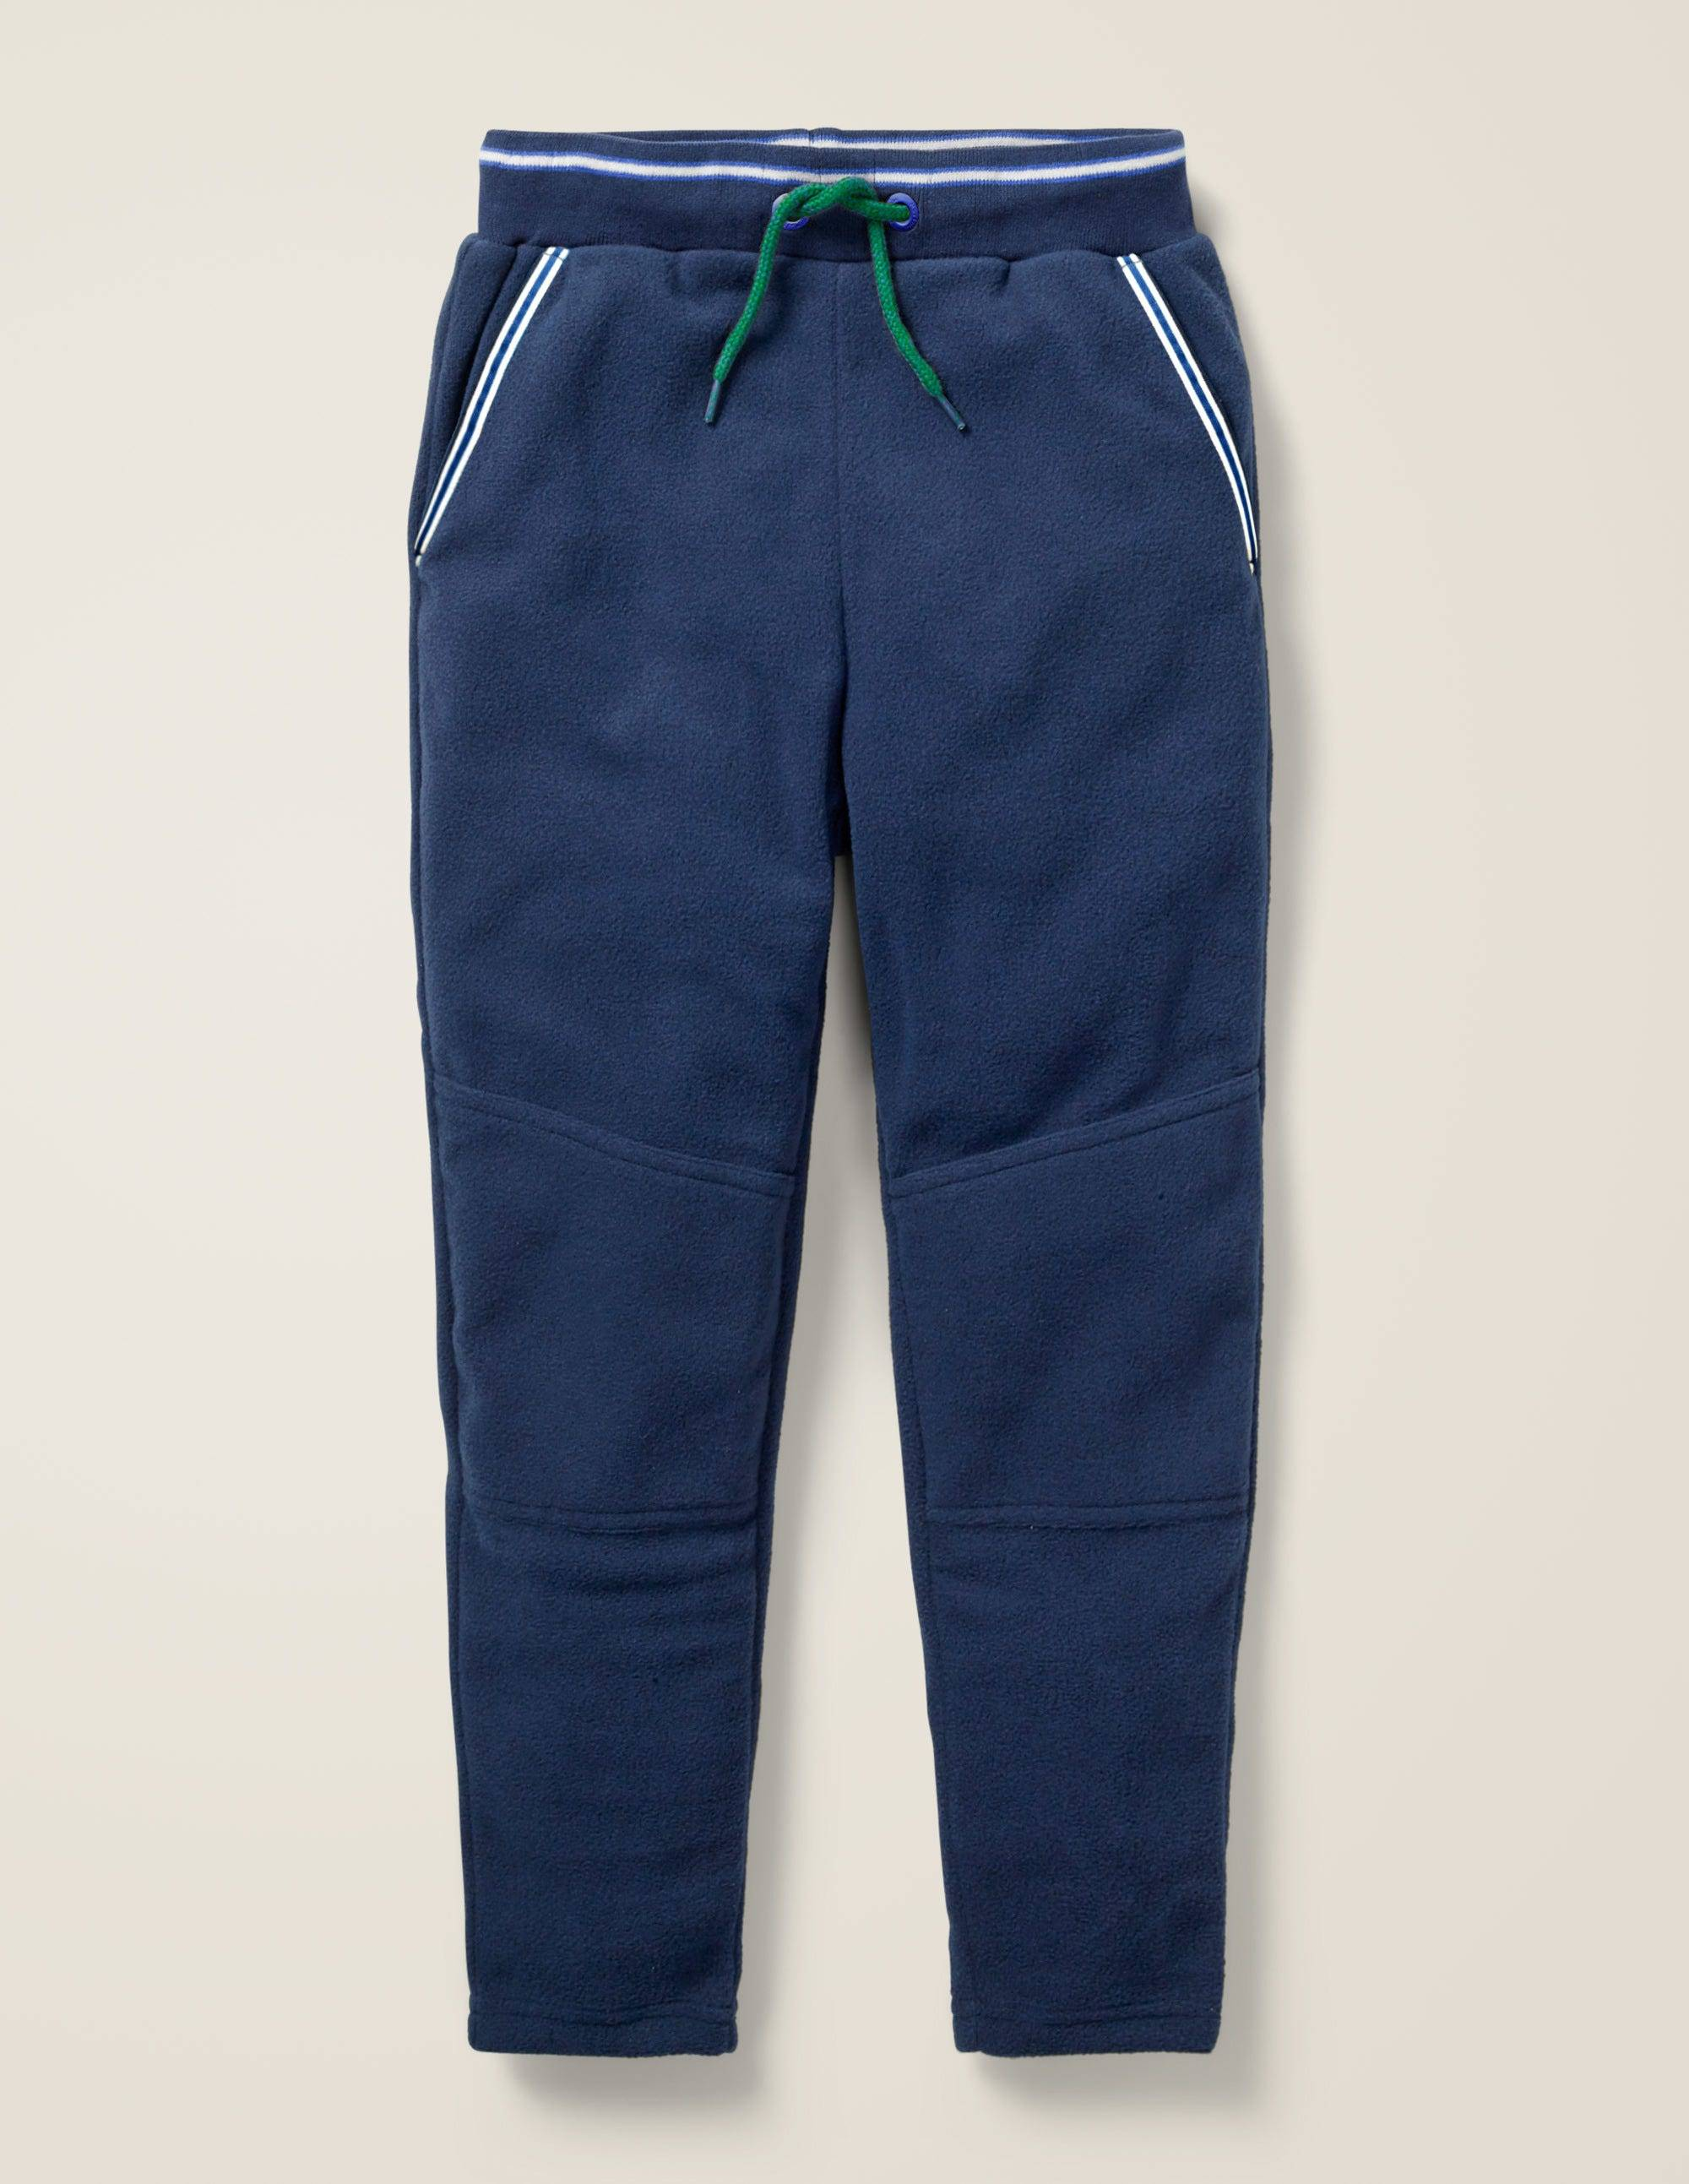 Mini Pantalon de survêtement en micro-polaire BLU Garçon Boden, Blue - 10a